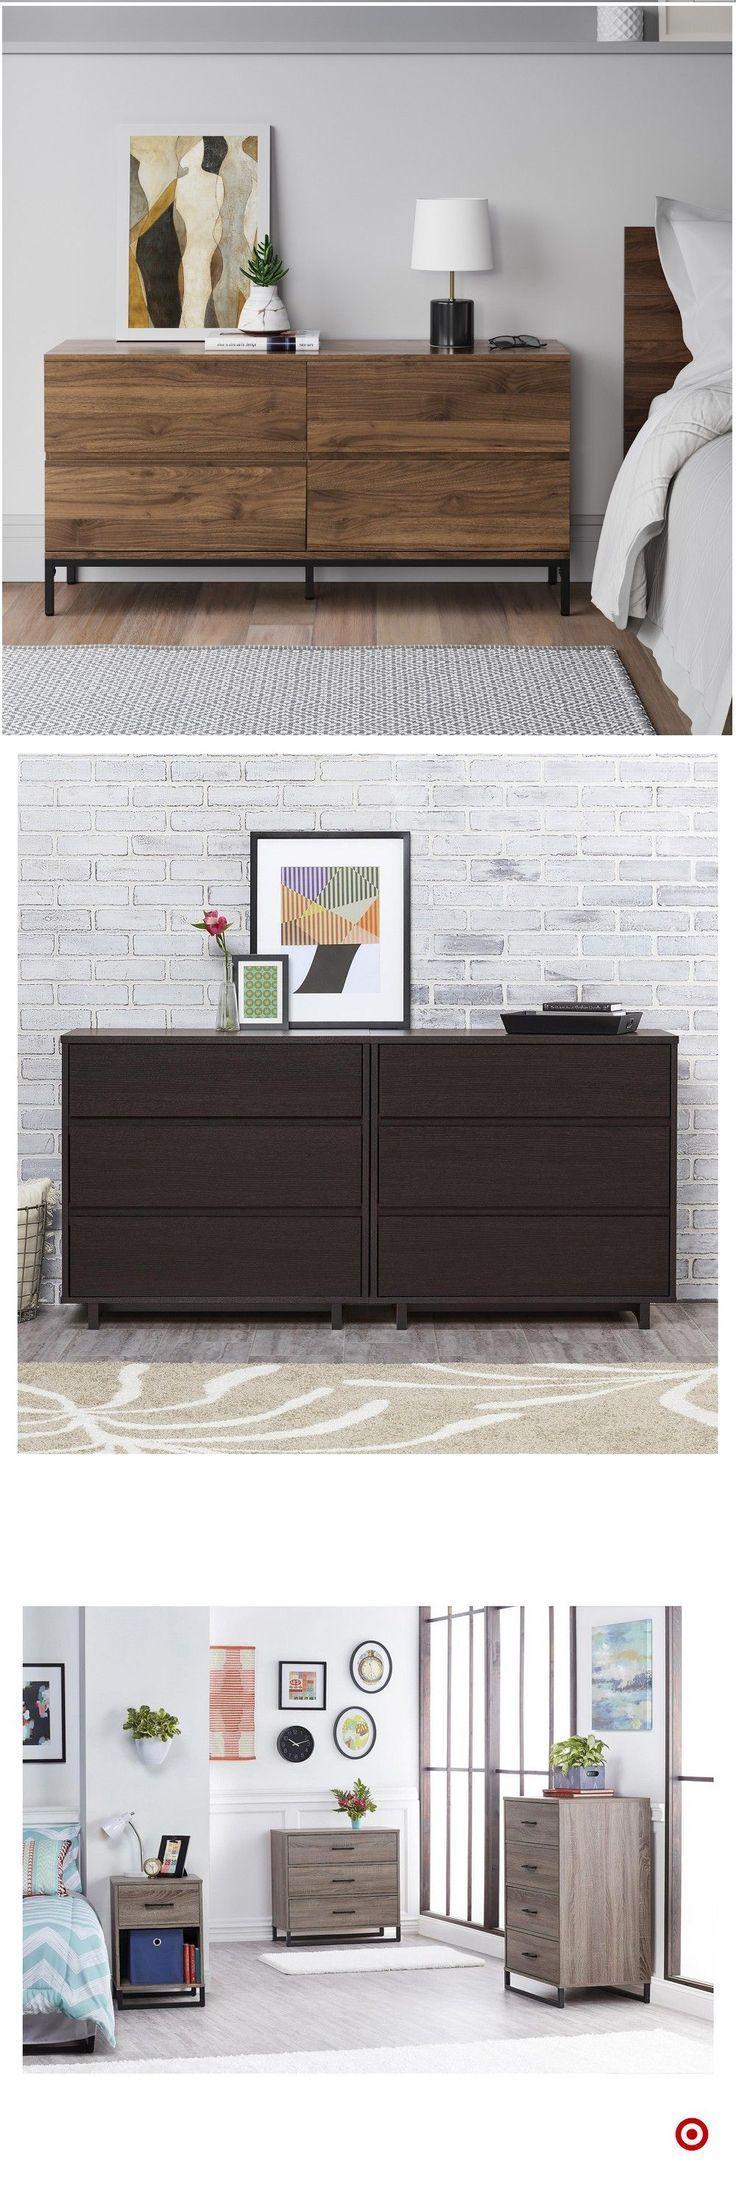 17 best Dressers images on Pinterest | Bedrooms, Bathrooms decor ...